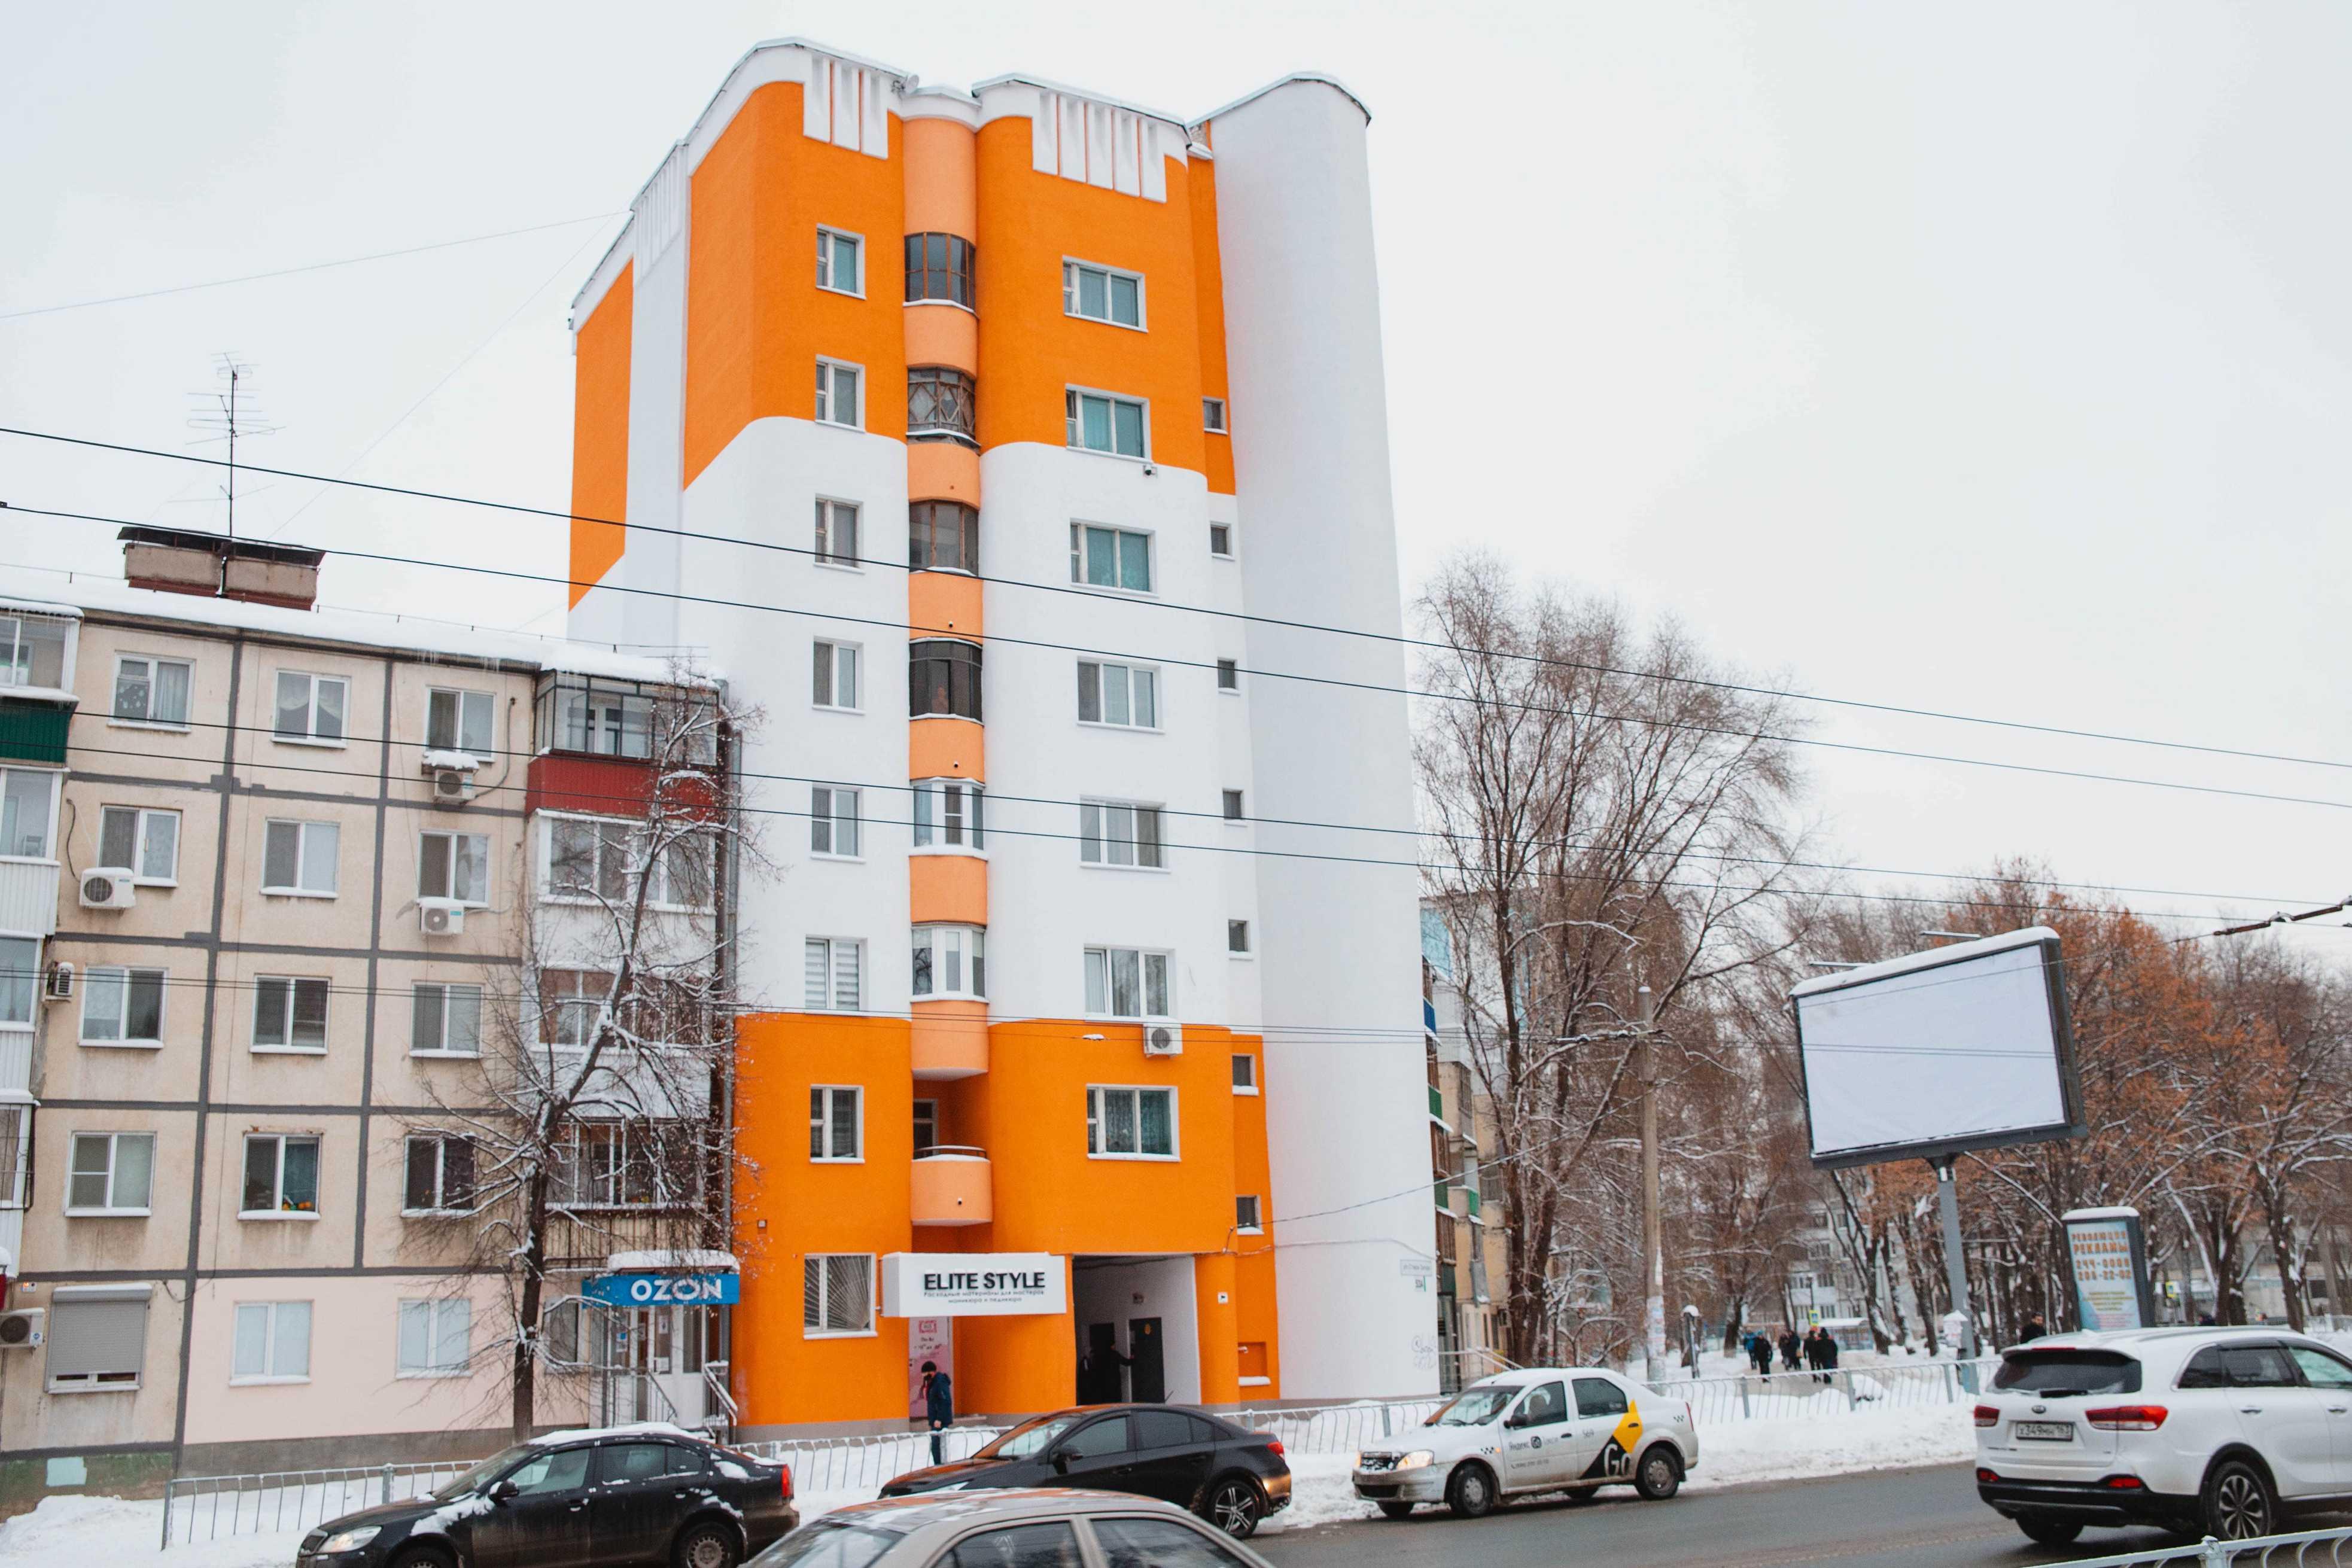 Дом станкостроителей на улице Стара-зАГОРА